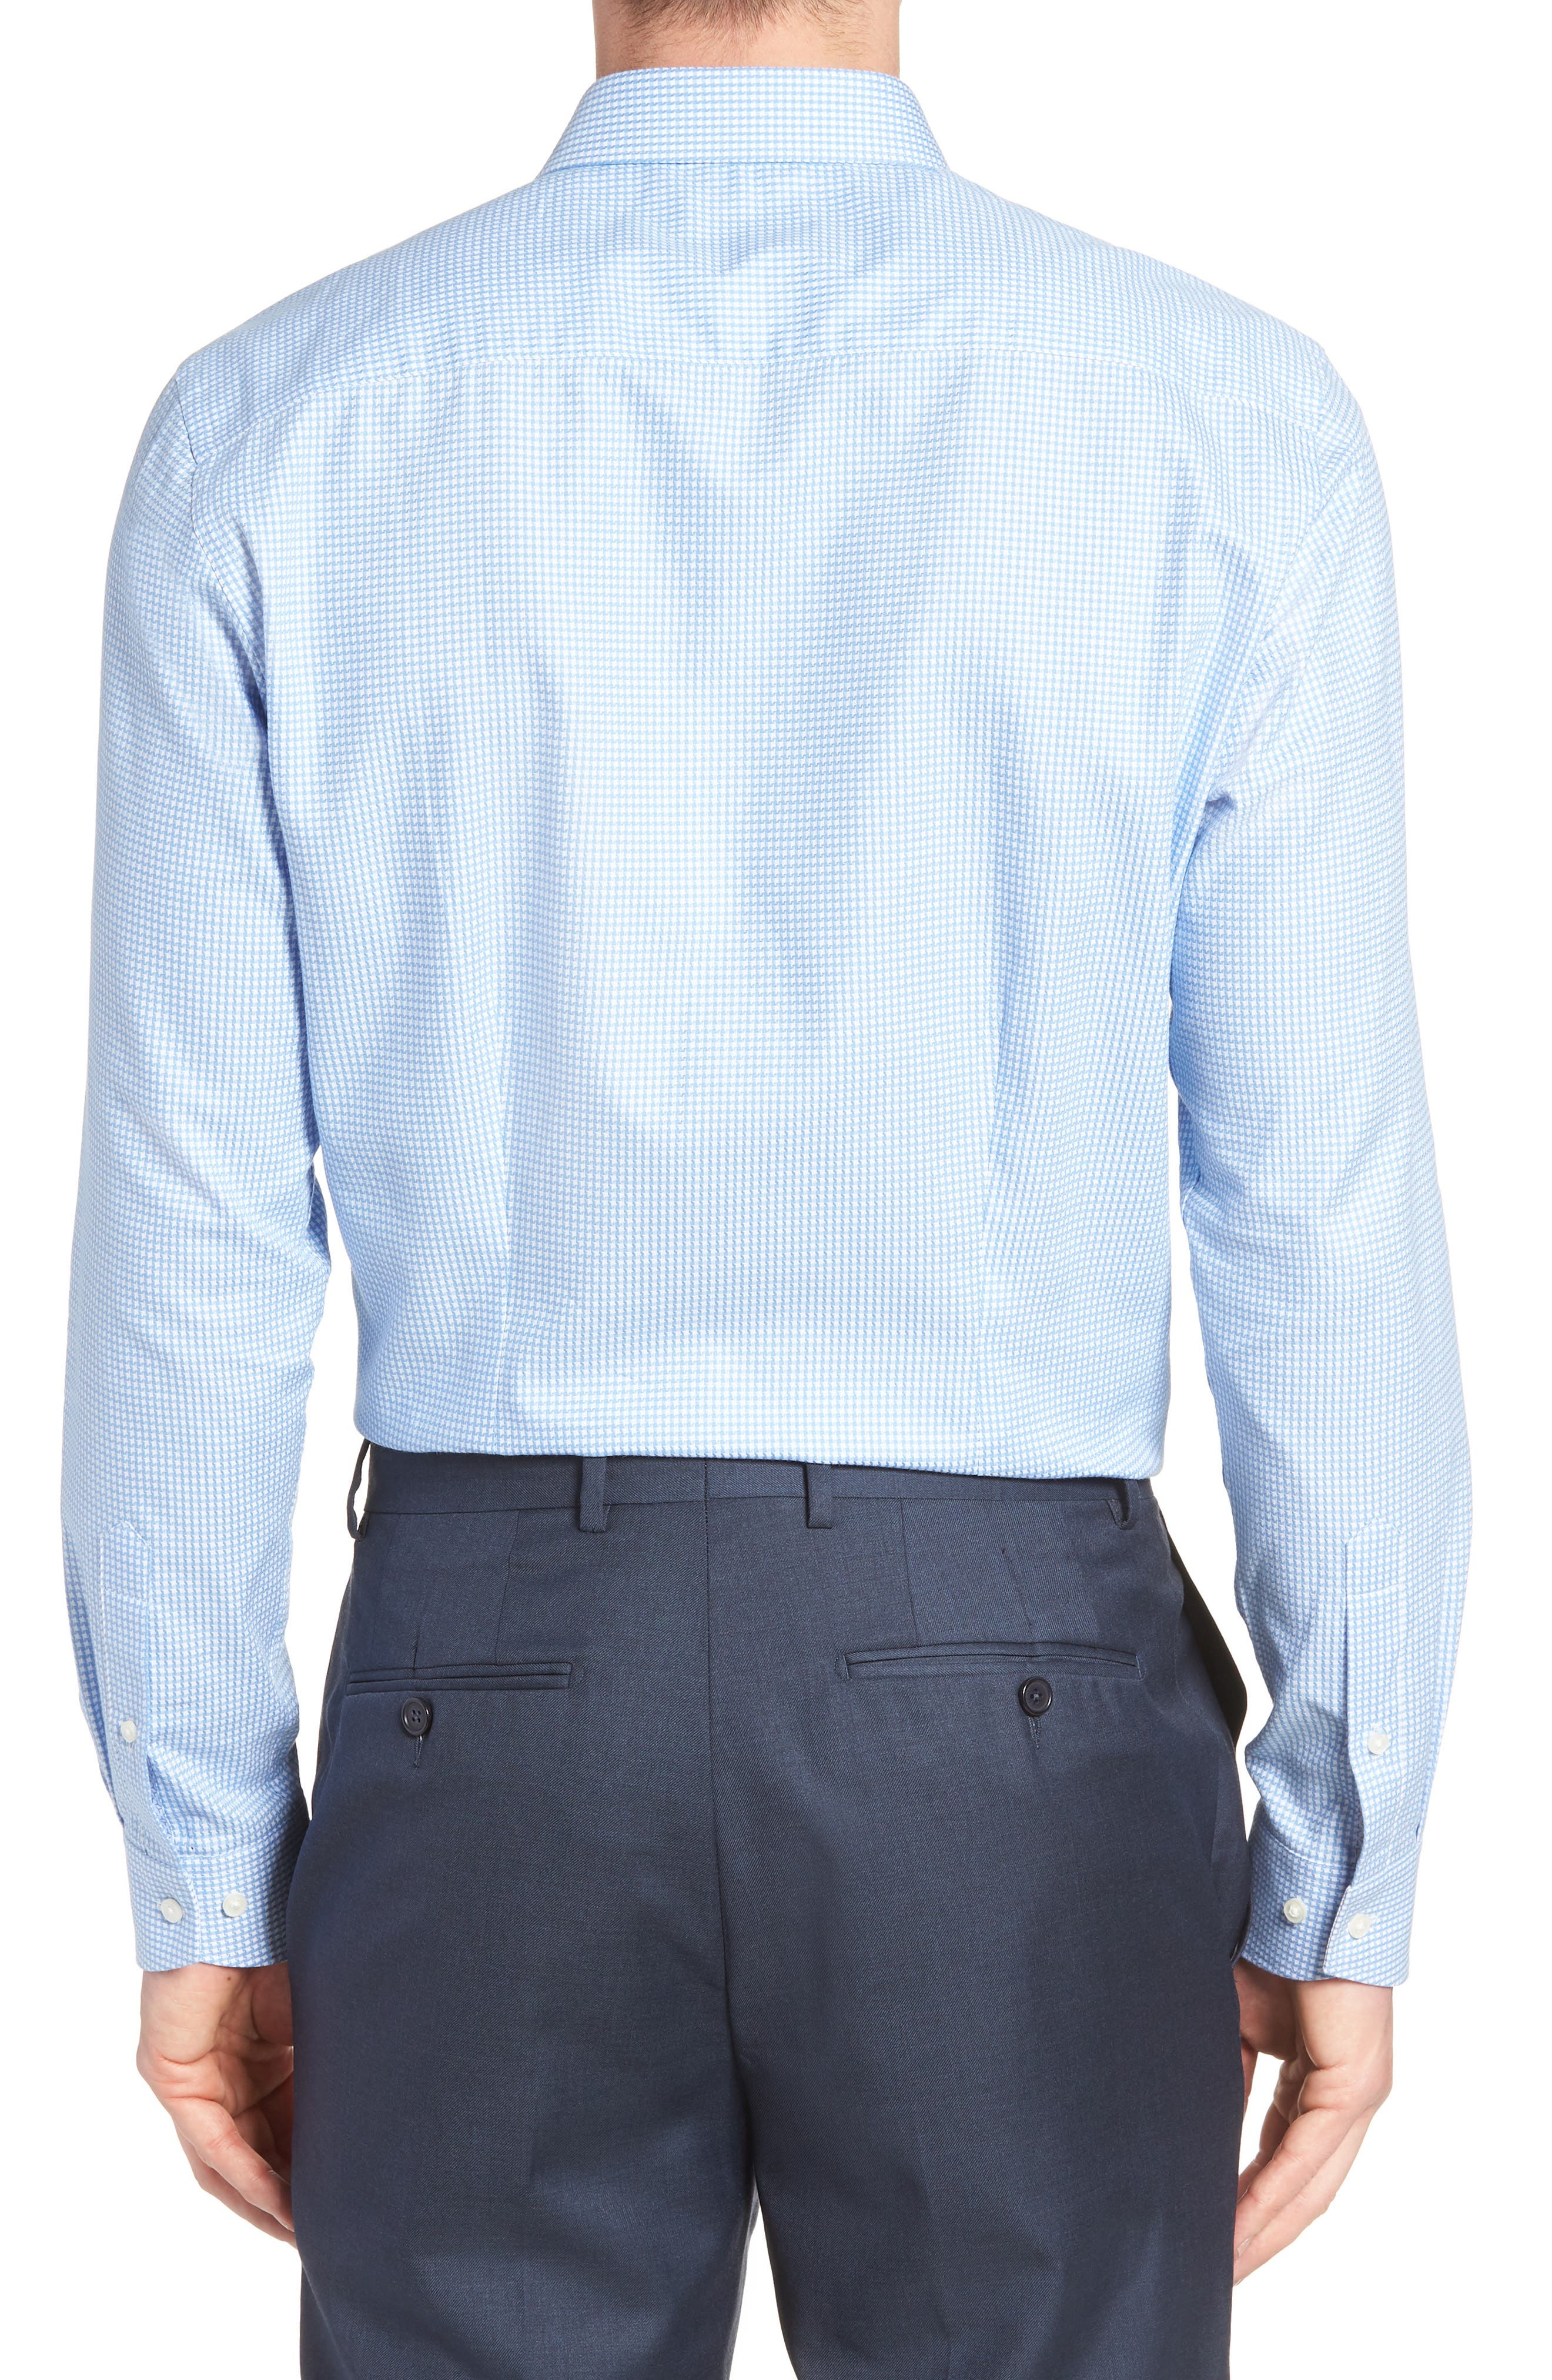 Jaiden Trim Fit Houndstooth Dress Shirt,                             Alternate thumbnail 3, color,                             Light Blue